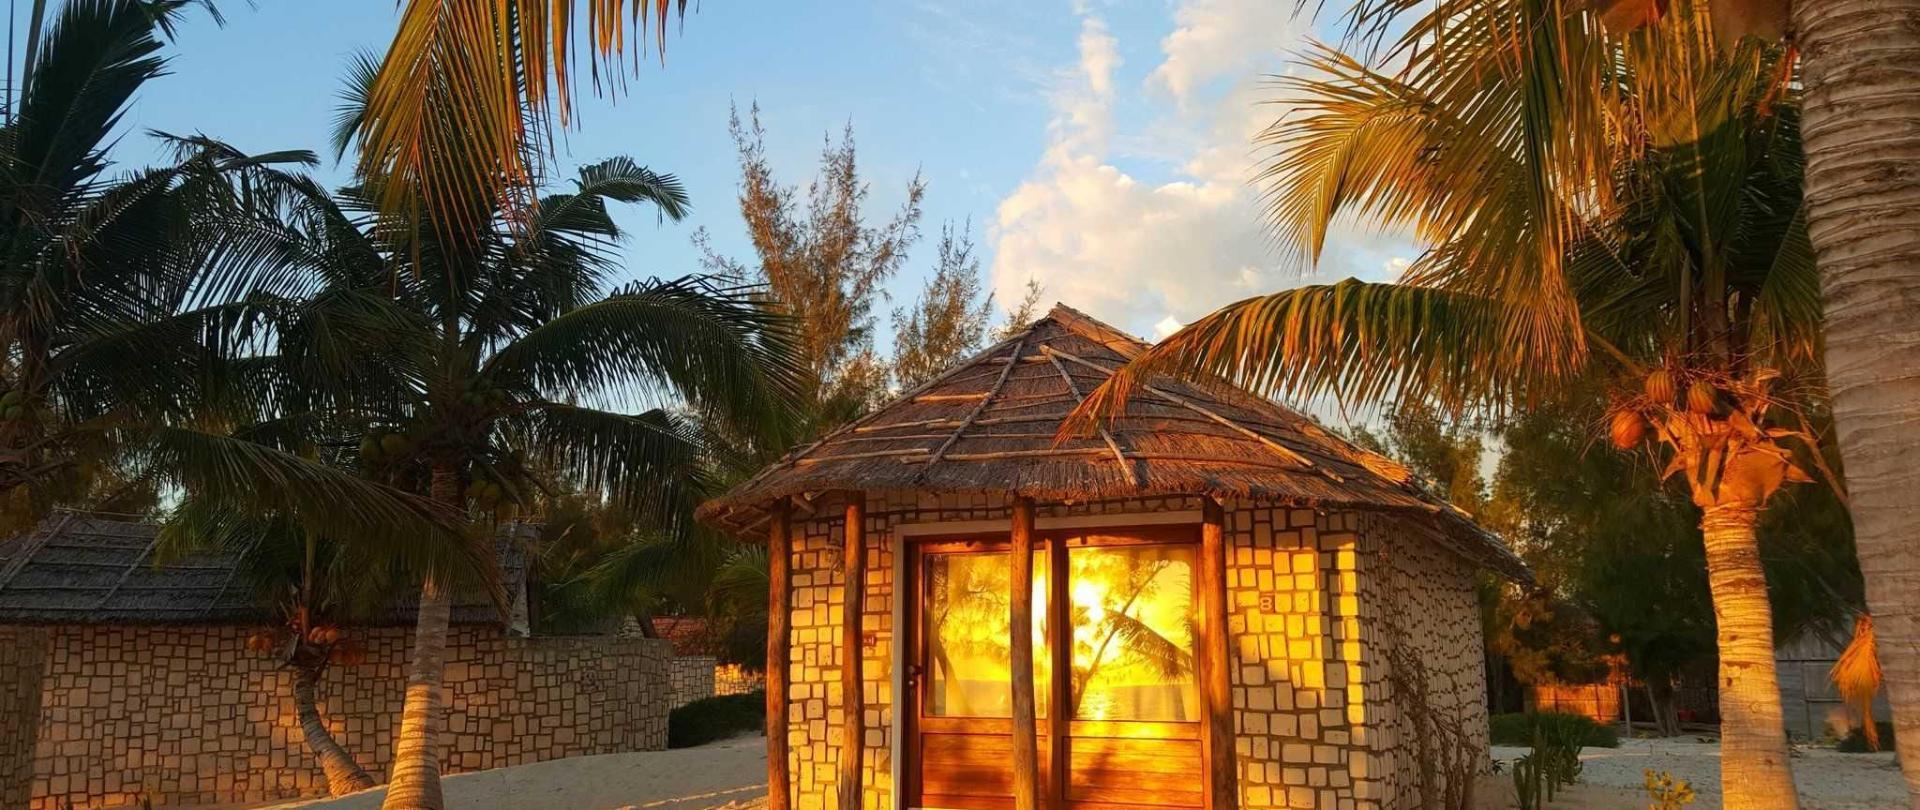 Hotel Laguna Blu – Resort Madagascar.jpg